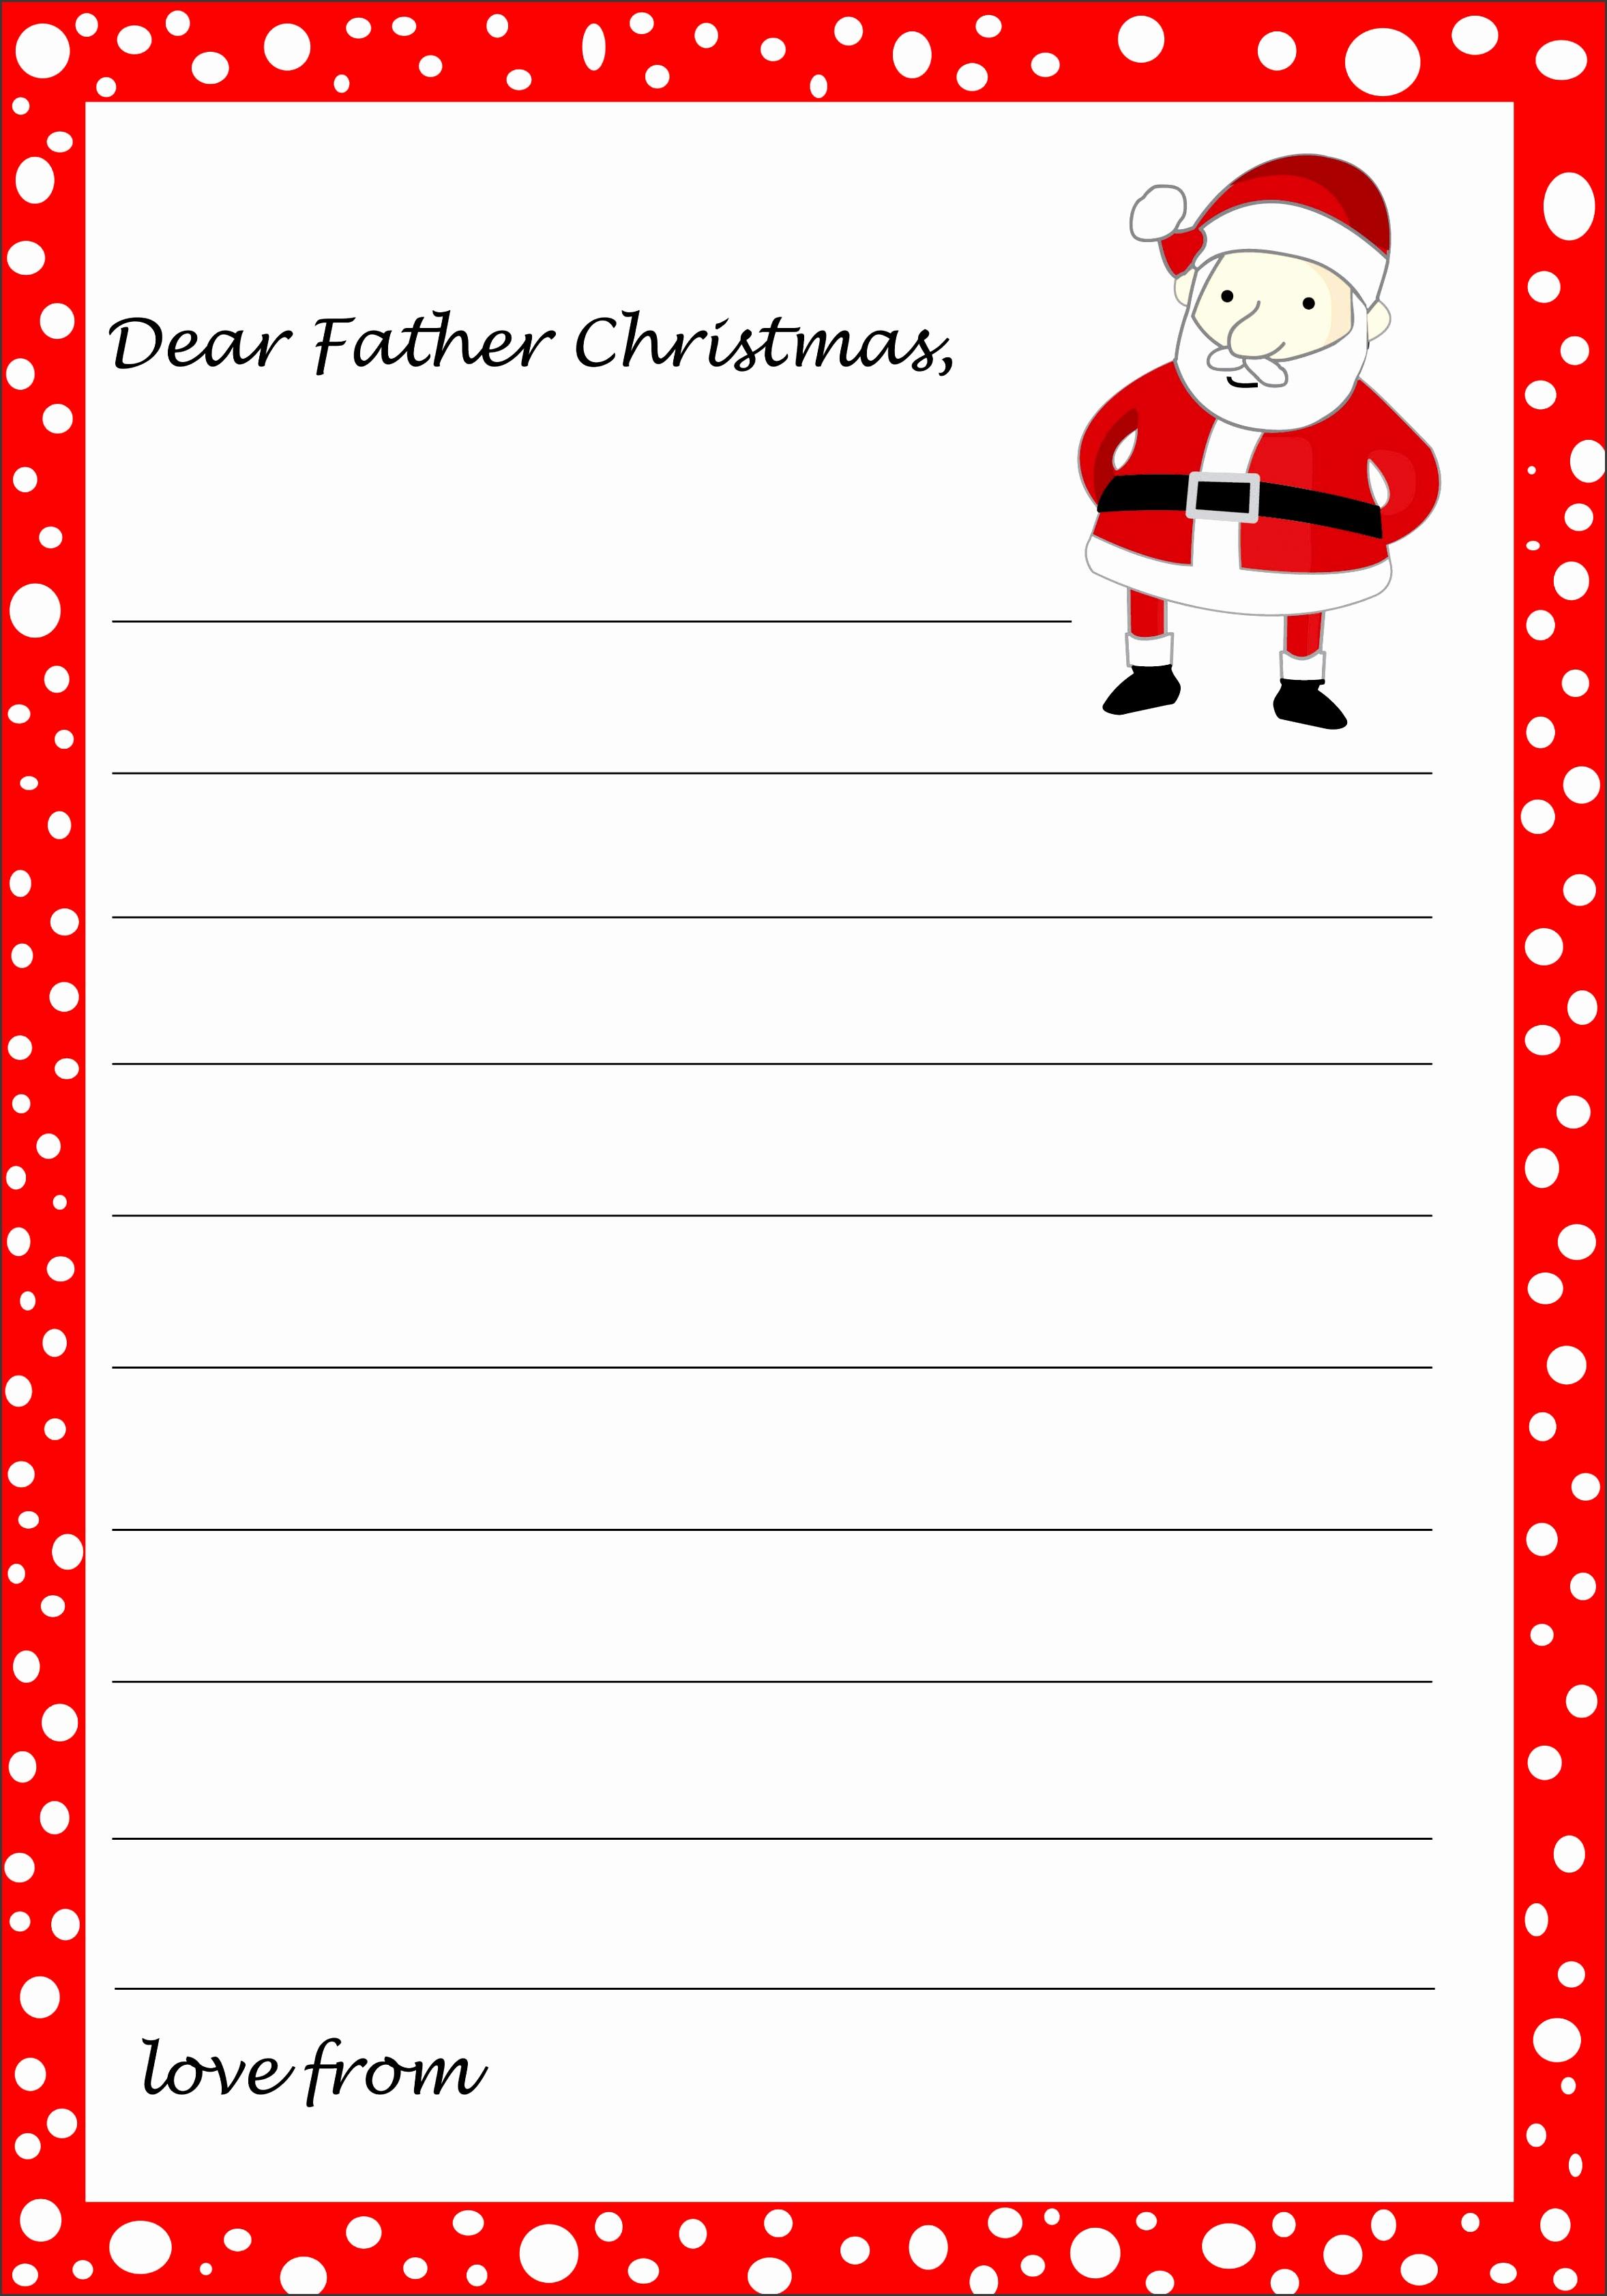 template letter to santa NVKKfIPb